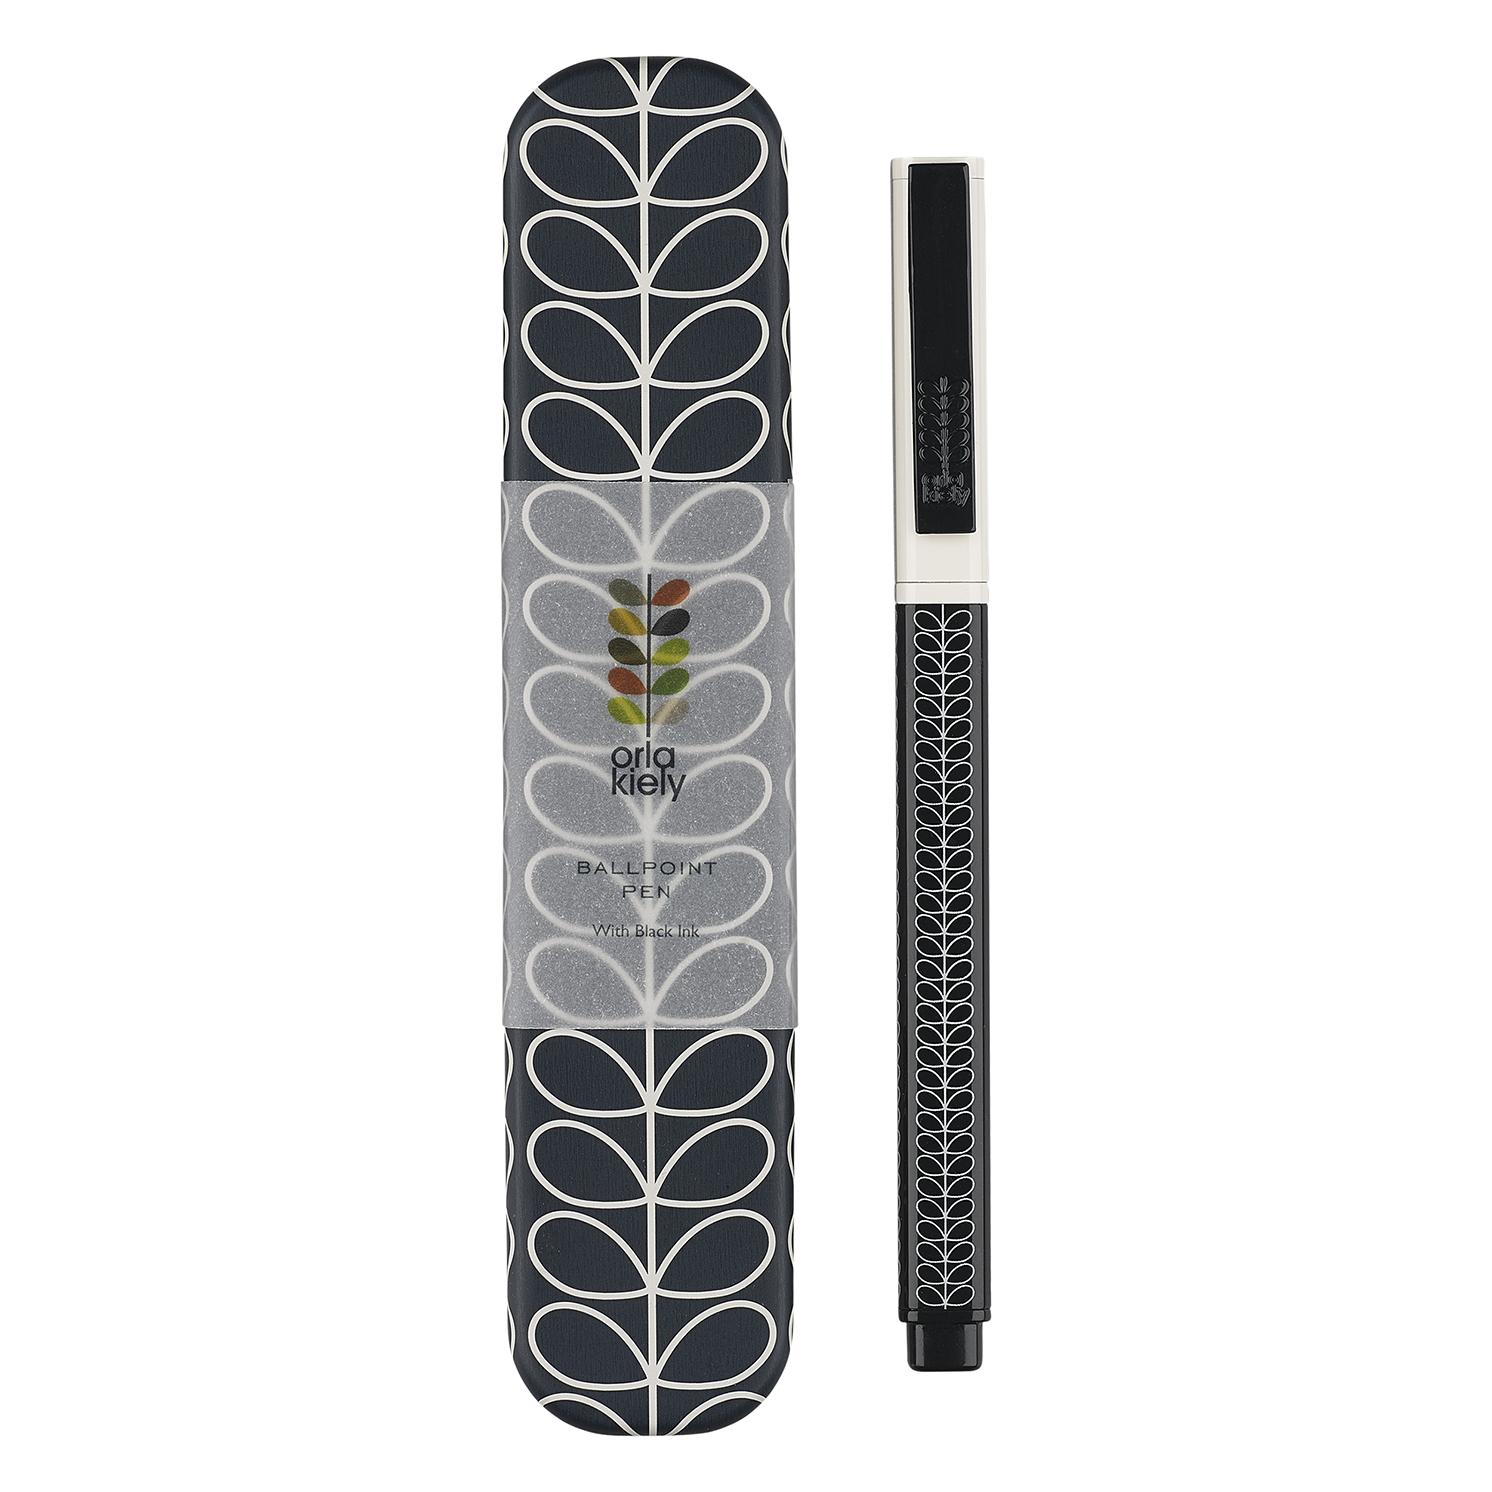 Orla Kiely – Navy Linear Stem Ballpoint Pen in Metal Presentation Gift Tin